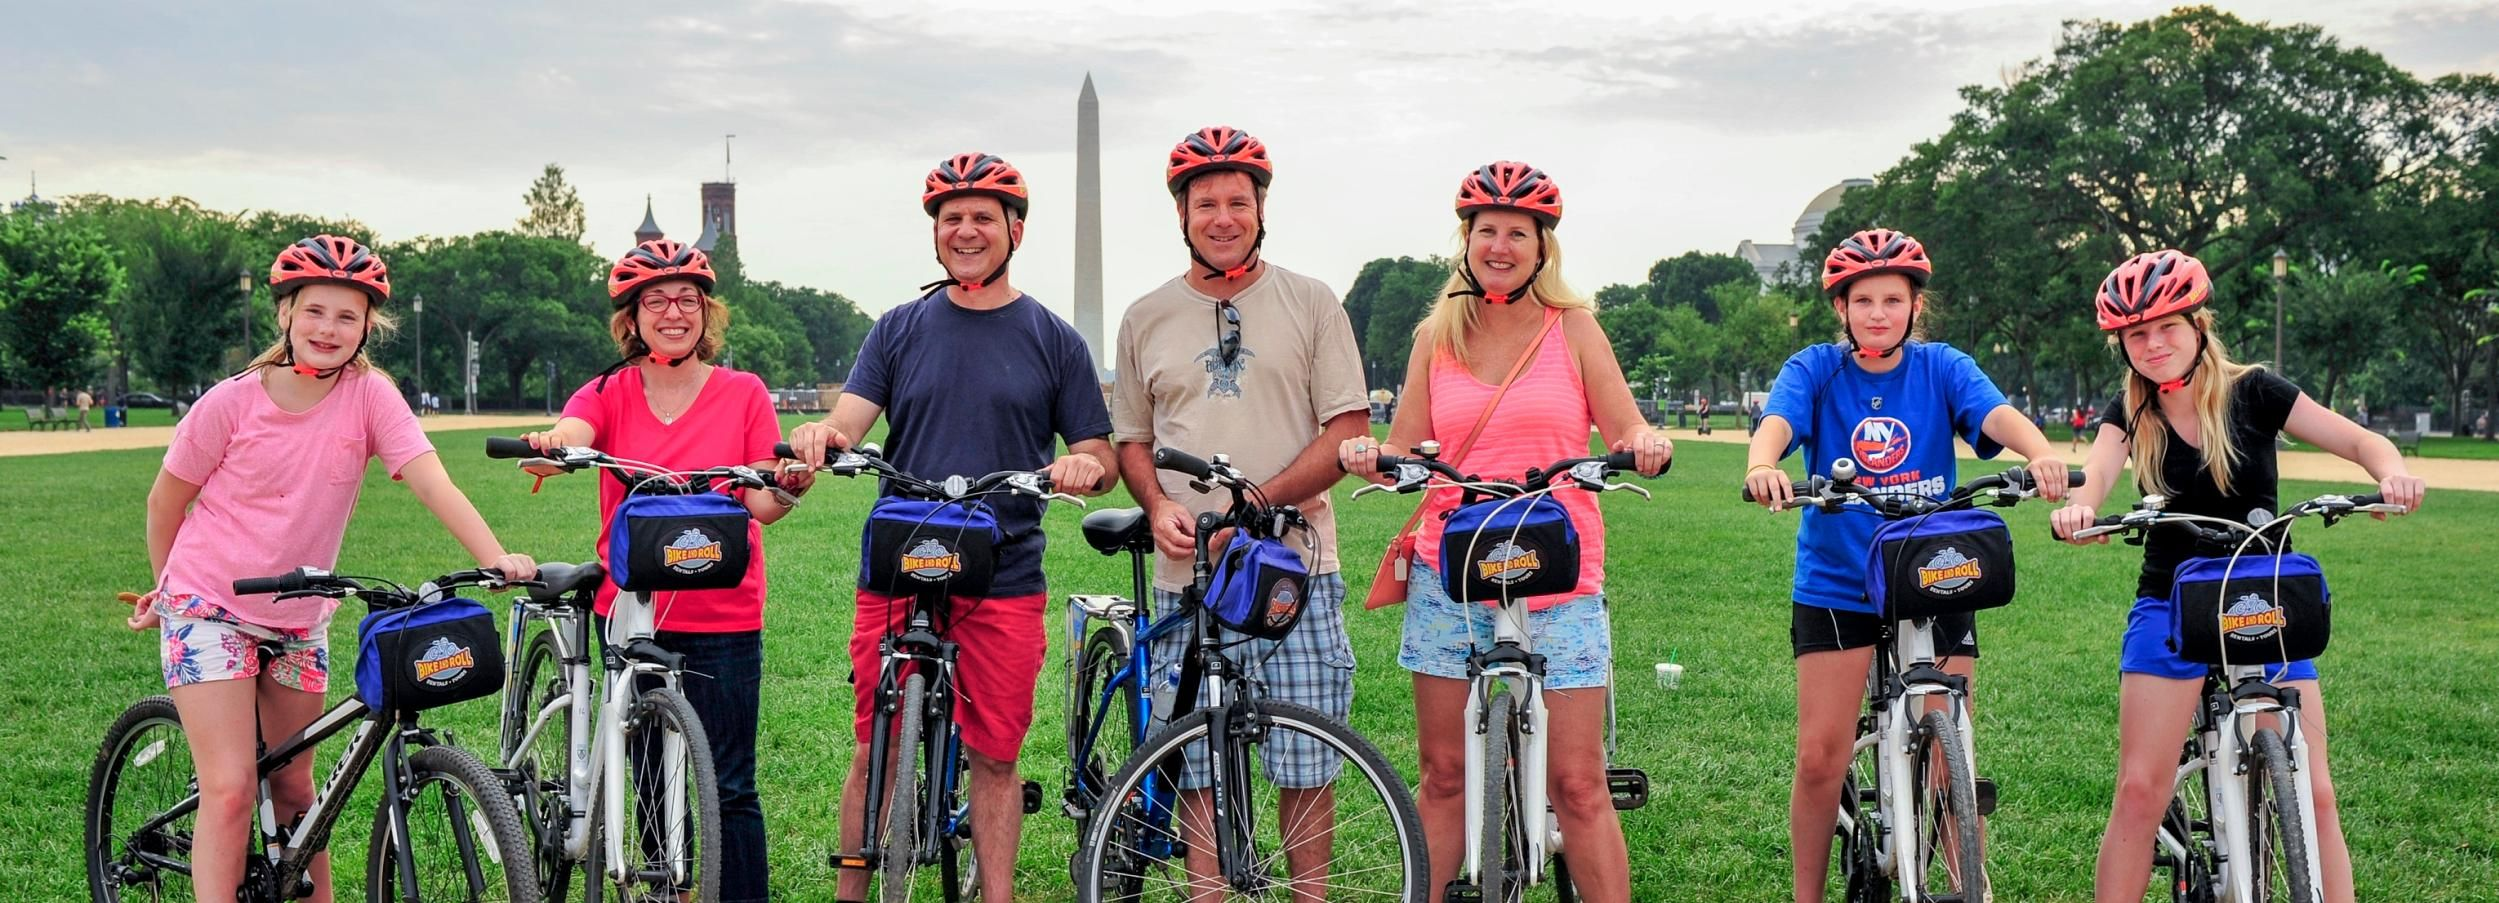 Washington DC: Monuments and Memorials Bike Tour